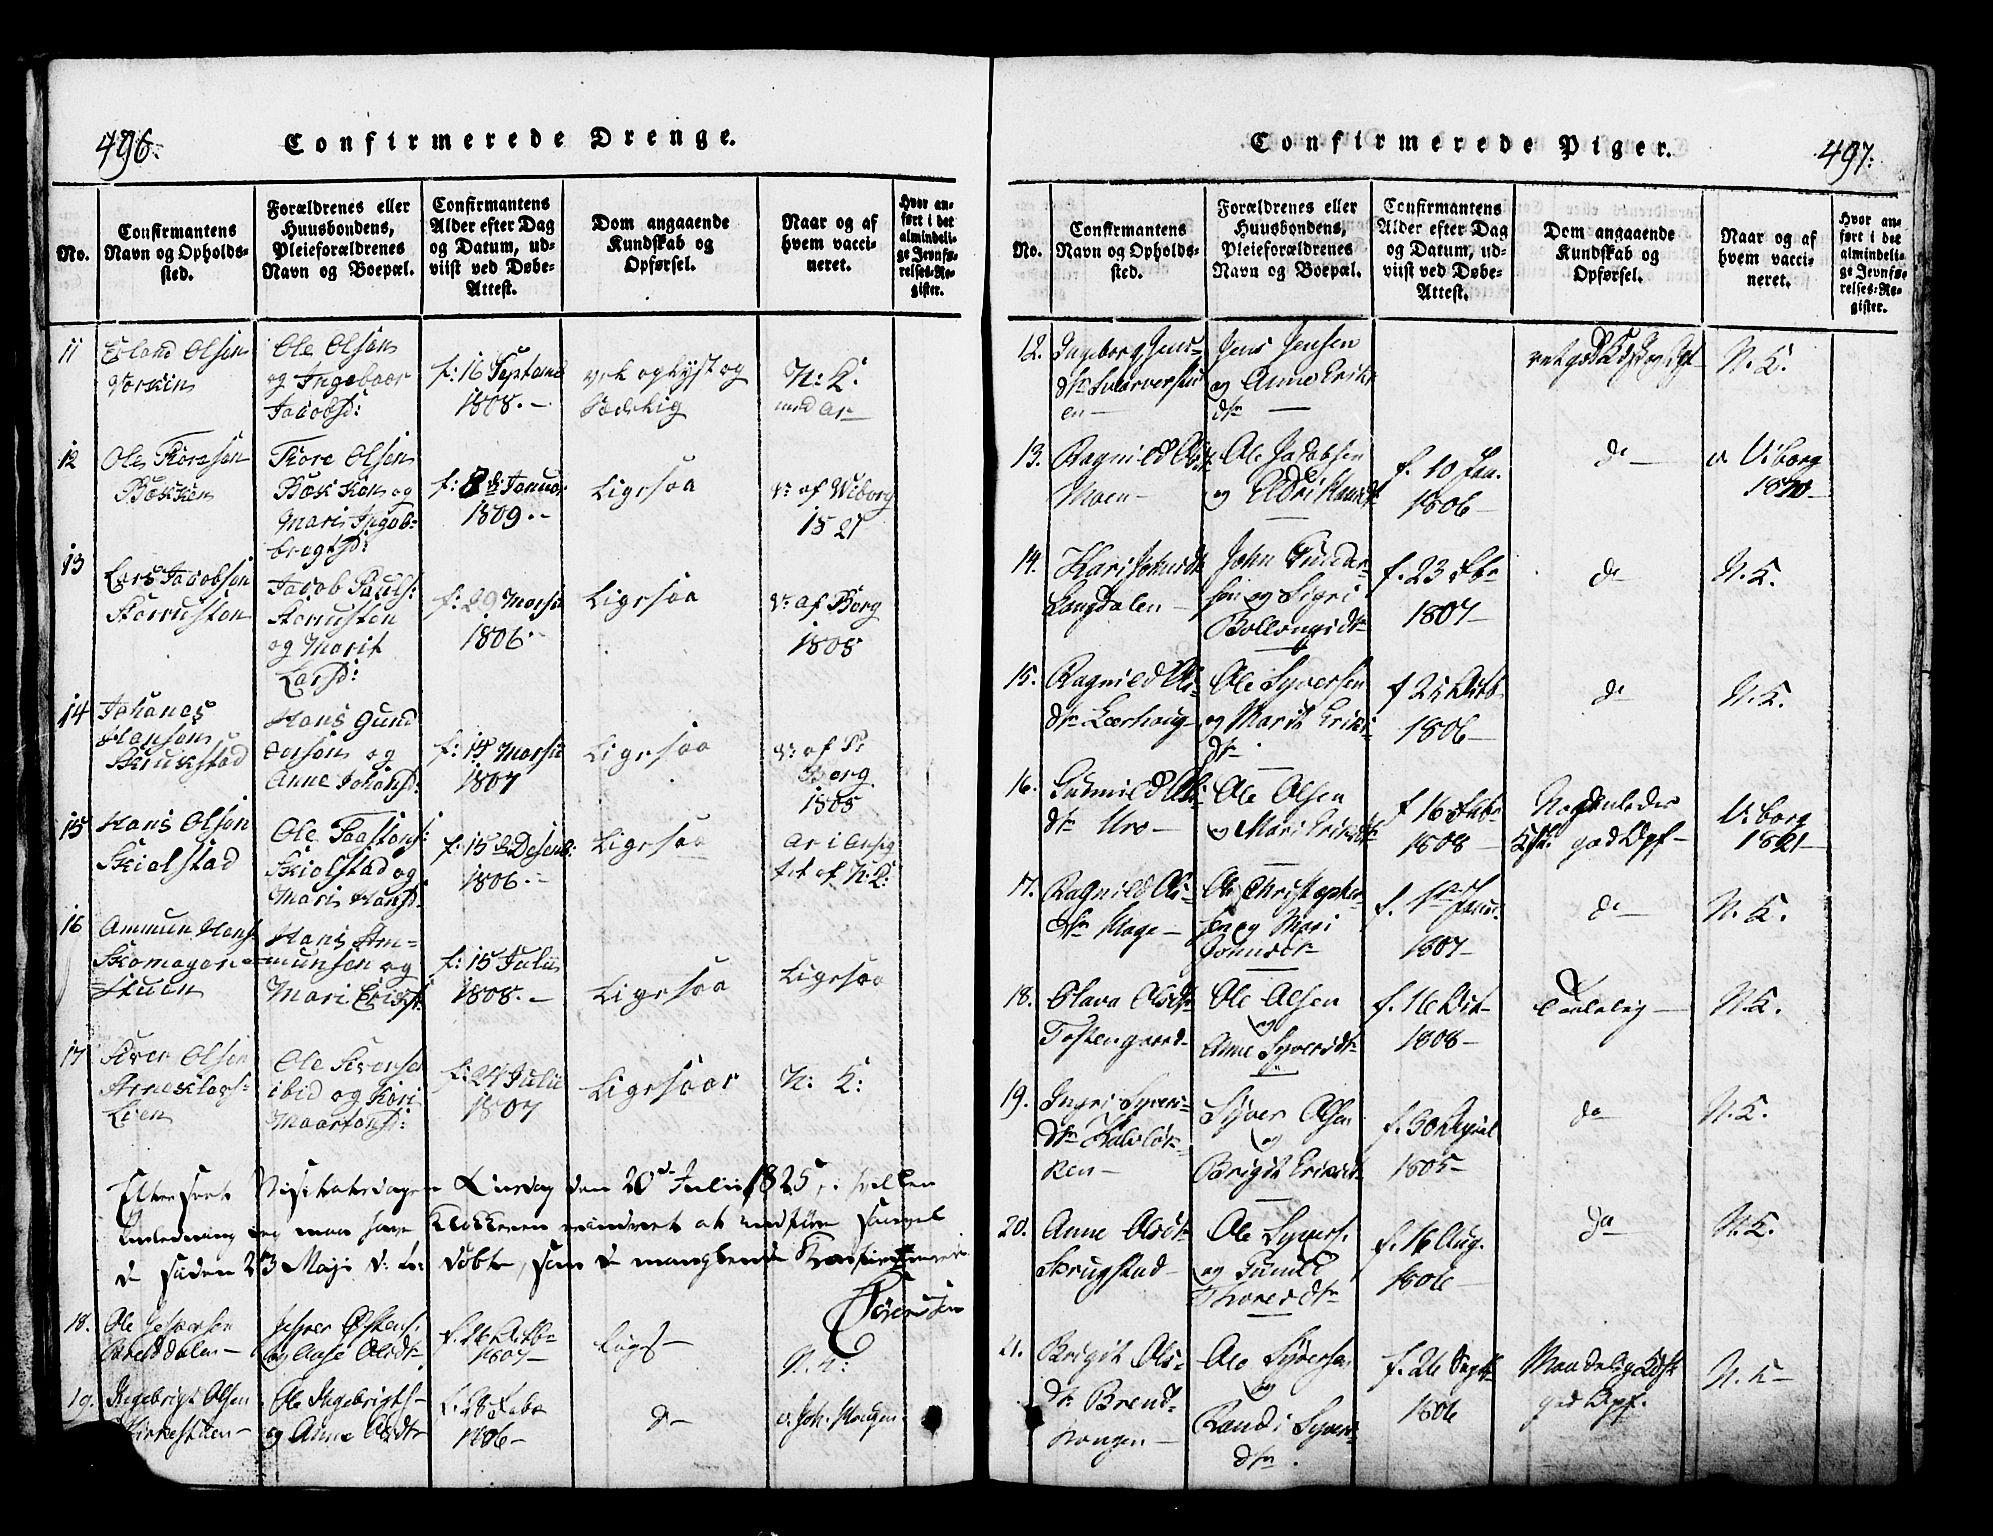 SAH, Lesja prestekontor, Klokkerbok nr. 1, 1820-1831, s. 496-497